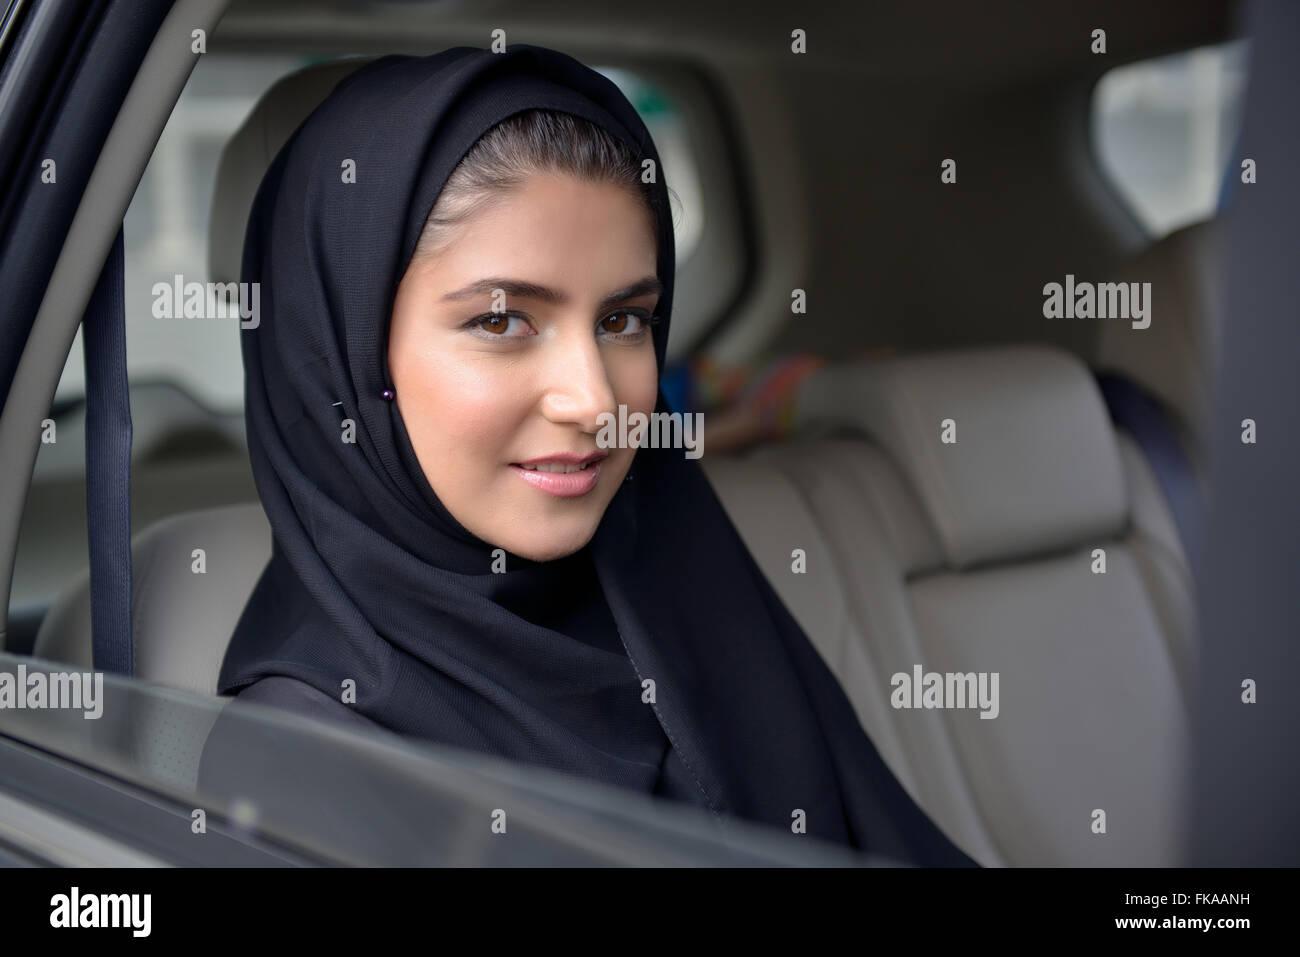 Emarati jeune business woman dans la voiture Photo Stock